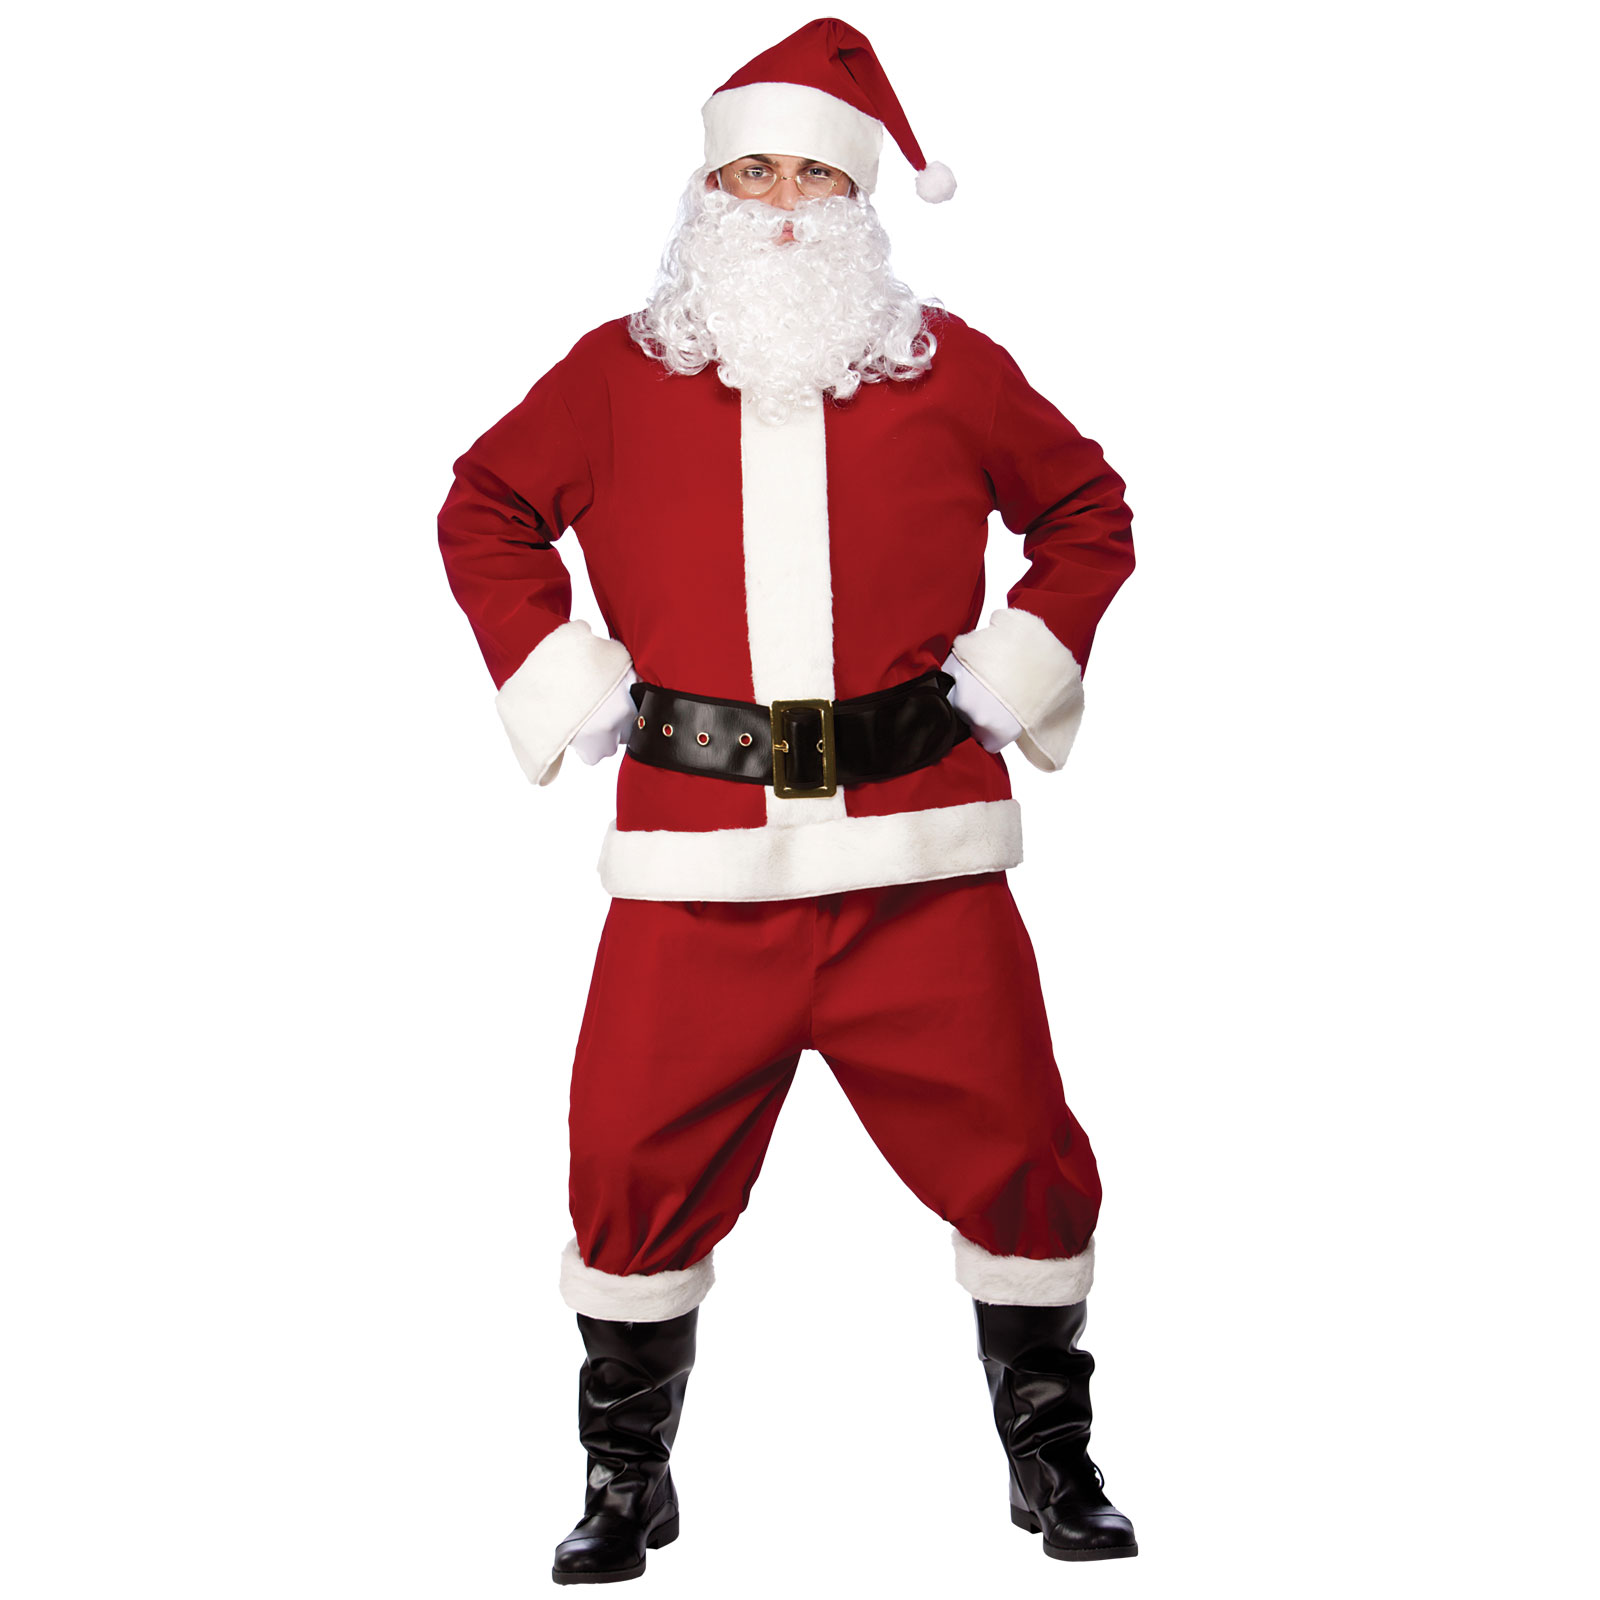 Christmas dress up - Professional Santa Suit Fancy Dress Christmas Dress Up Festive Costume Outfit Christmas Xs Party